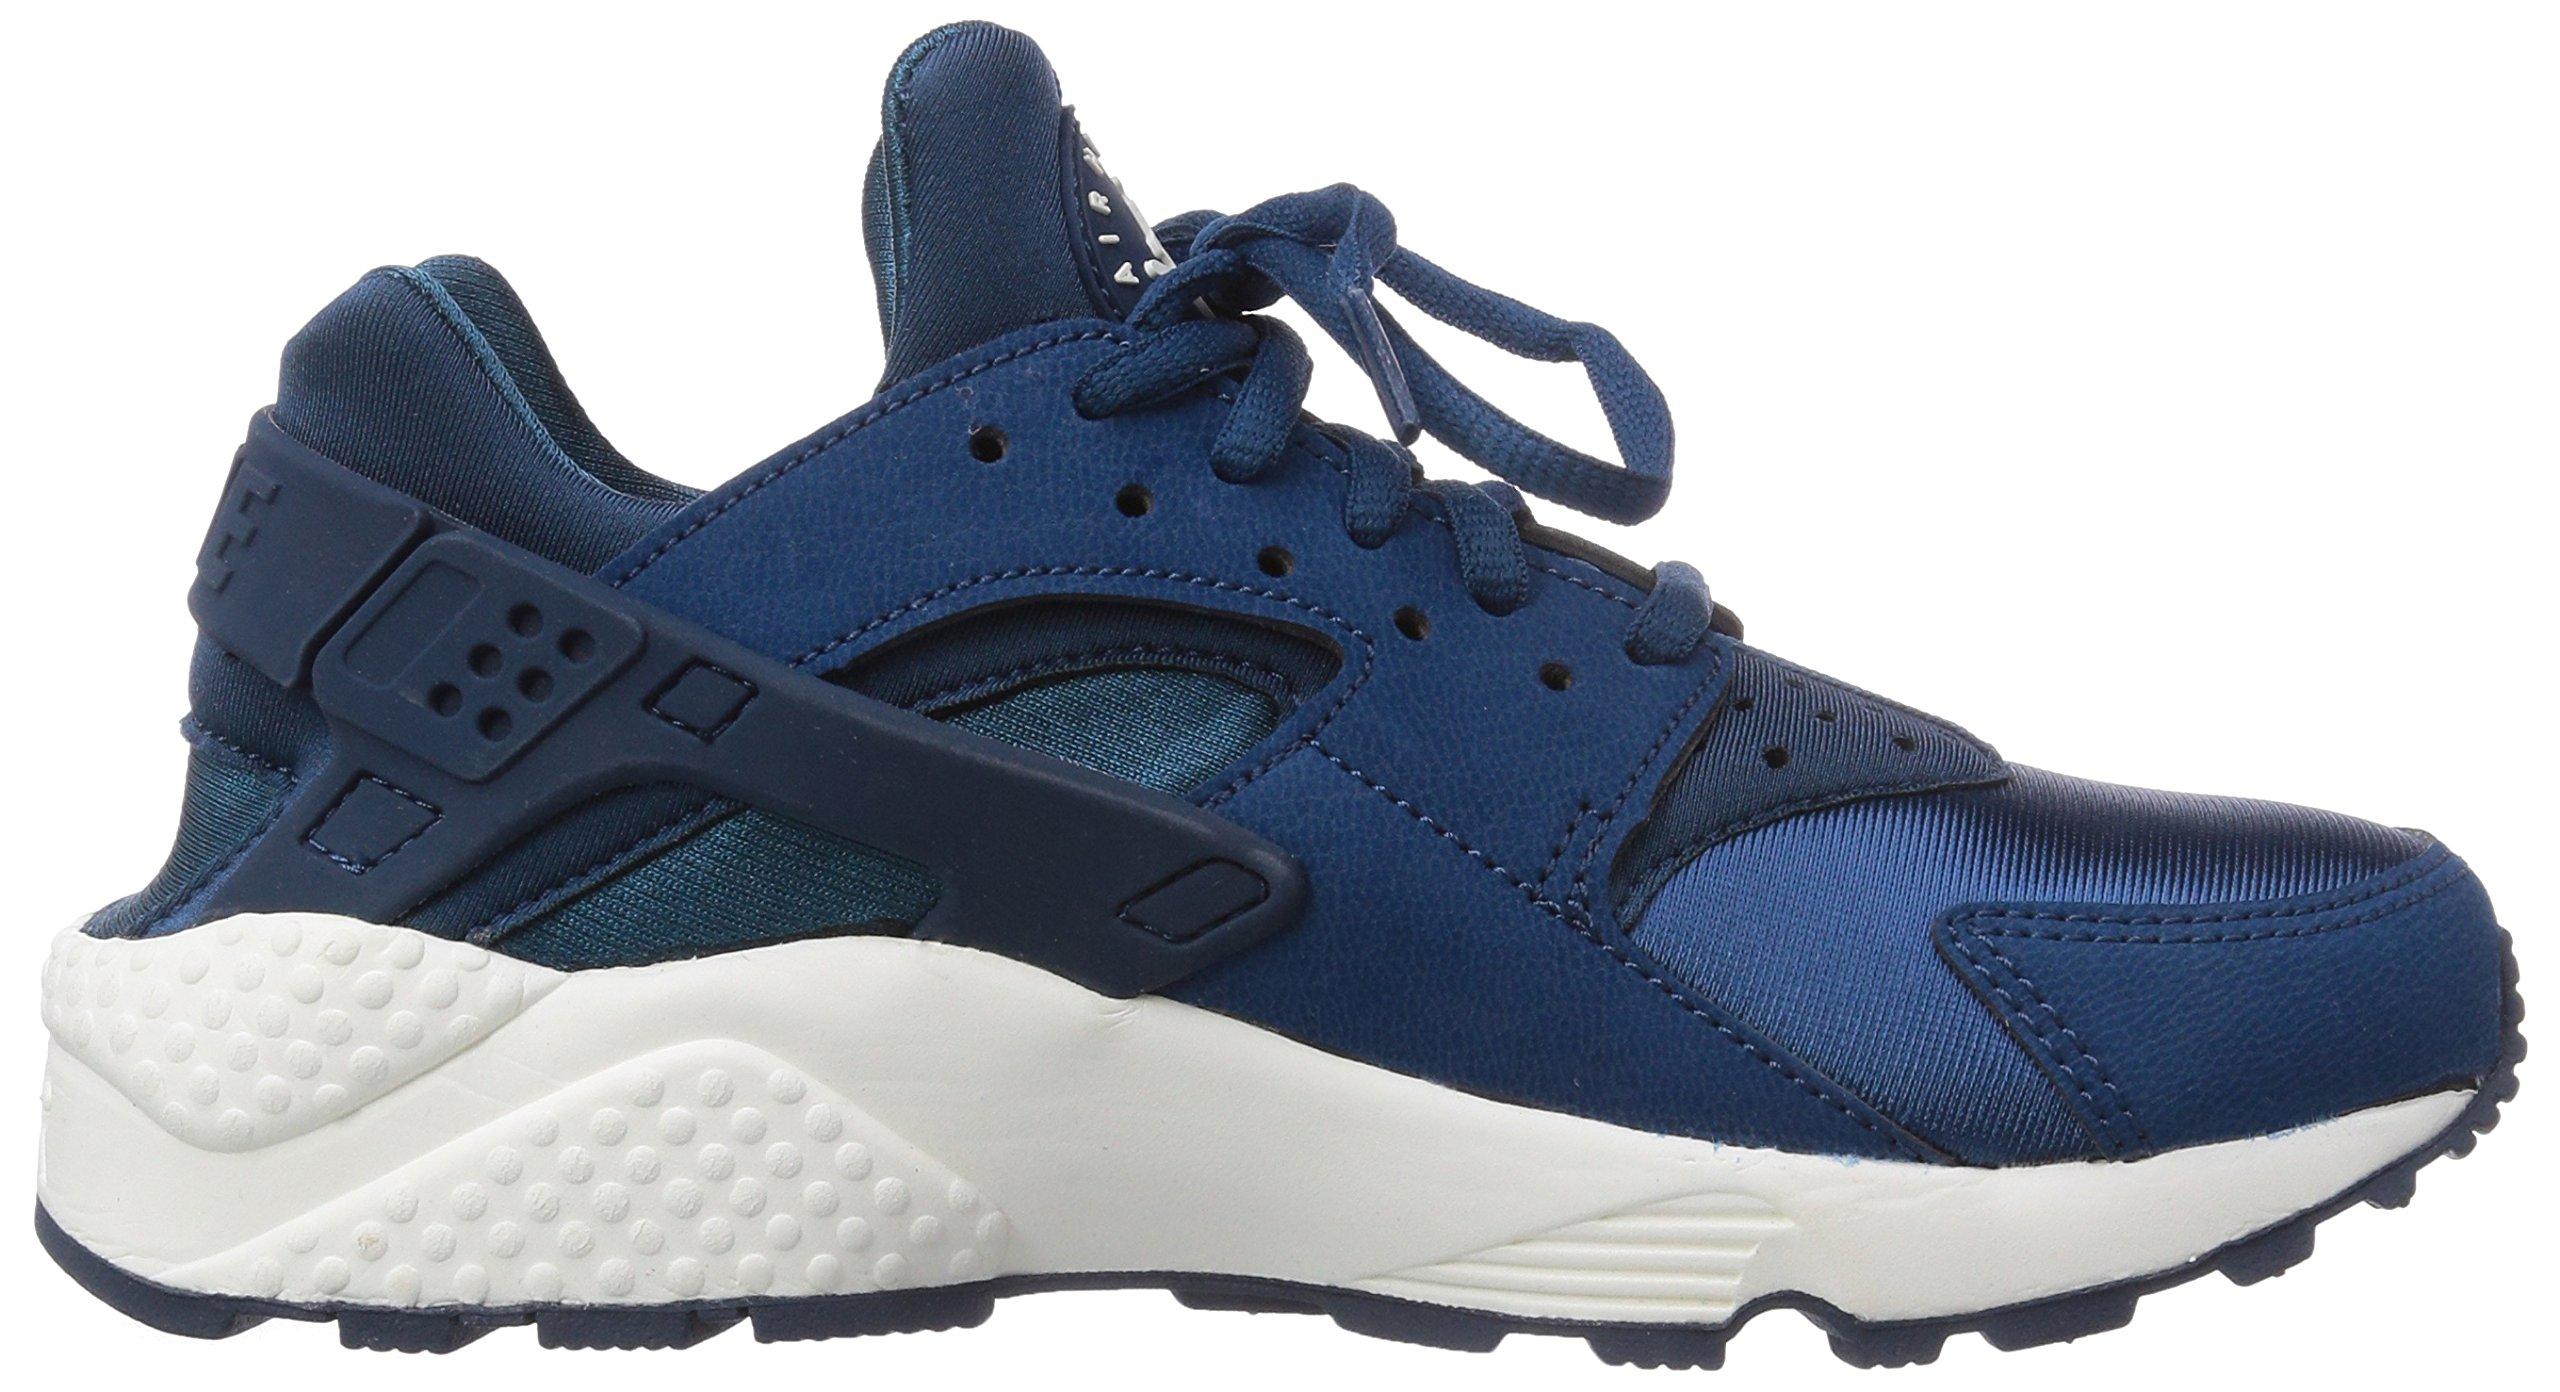 nike womens air huarache trainers 634835 sneakers shoes (UK 3 us 5.5 EU 36, blue force blue force sail 400) by NIKE (Image #6)